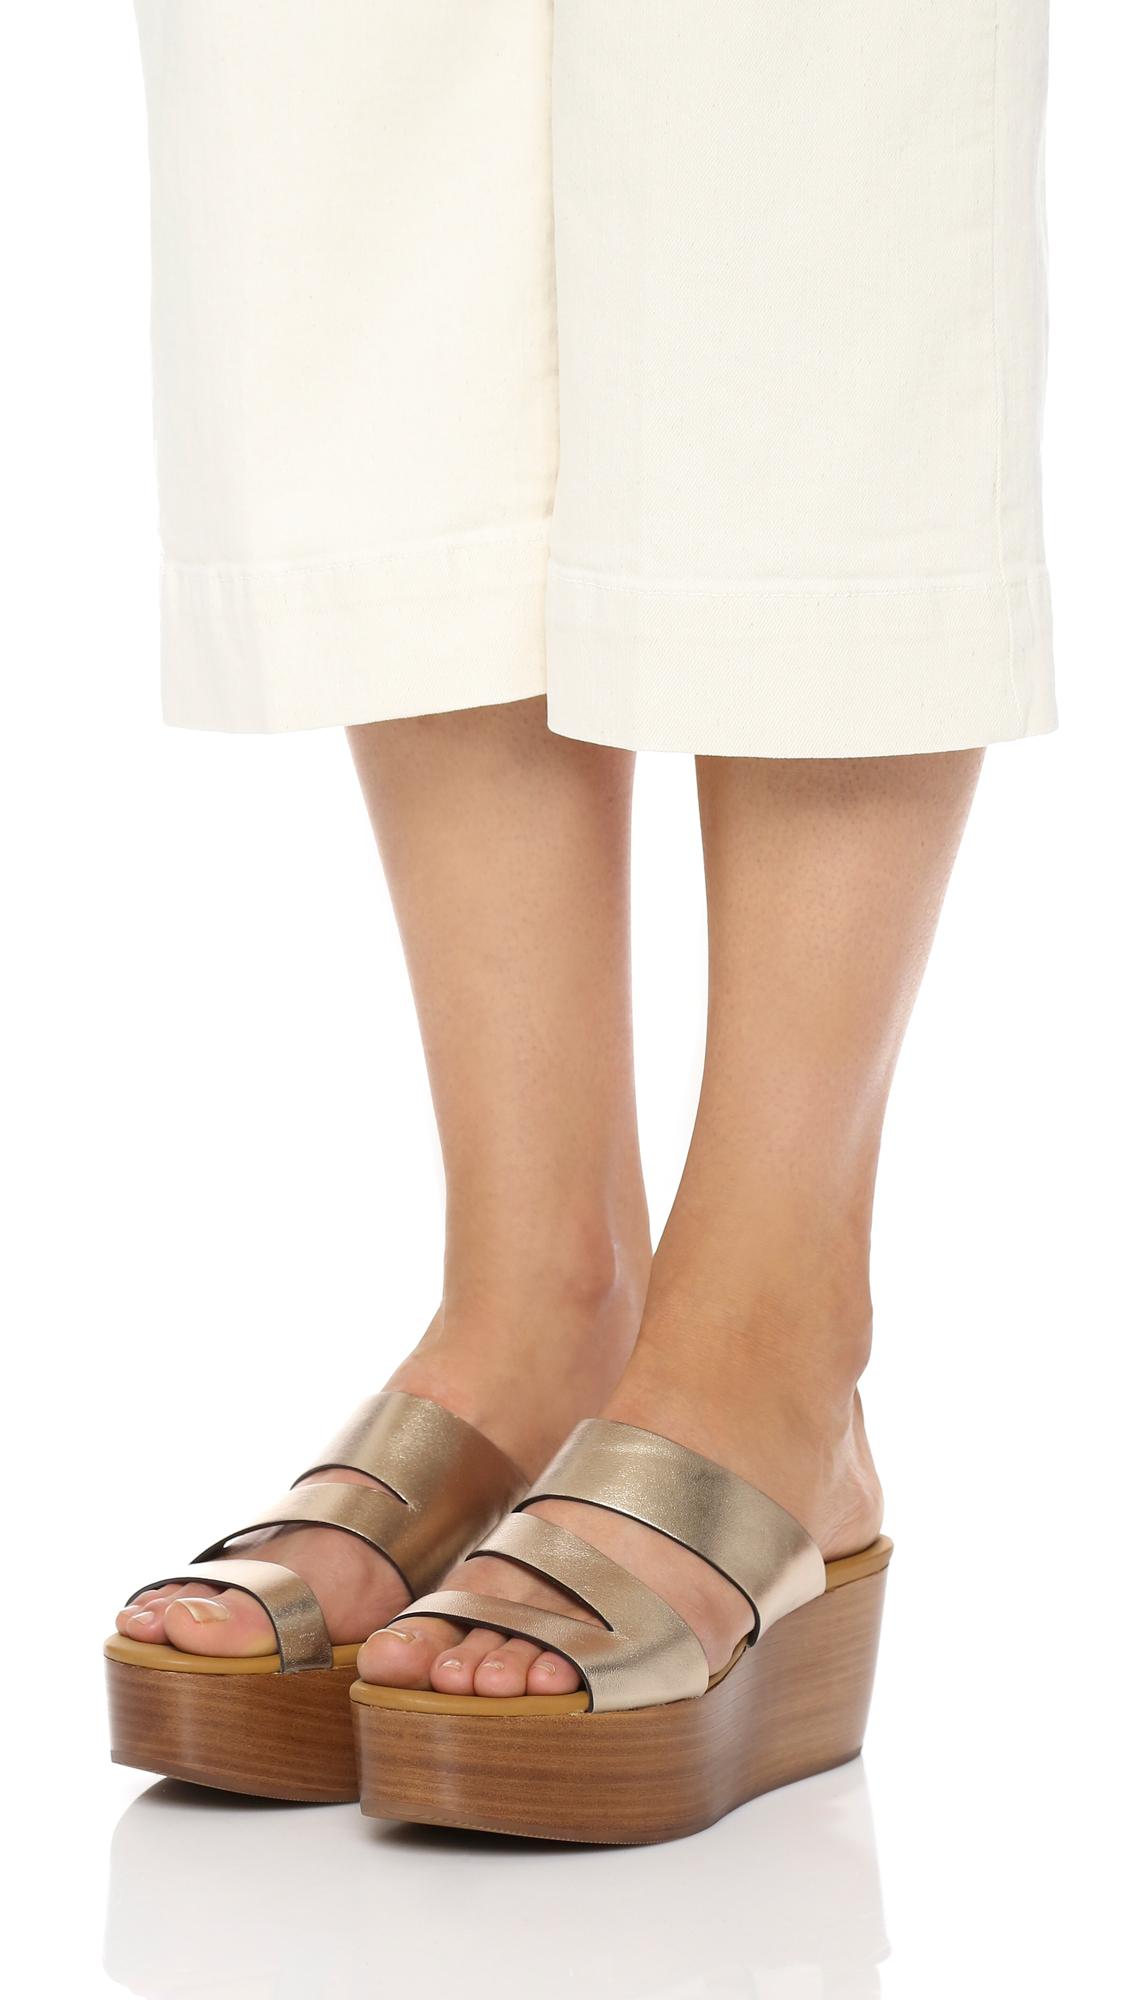 7f393f45338 See by Chloe Dania Platform Wedge Sandals